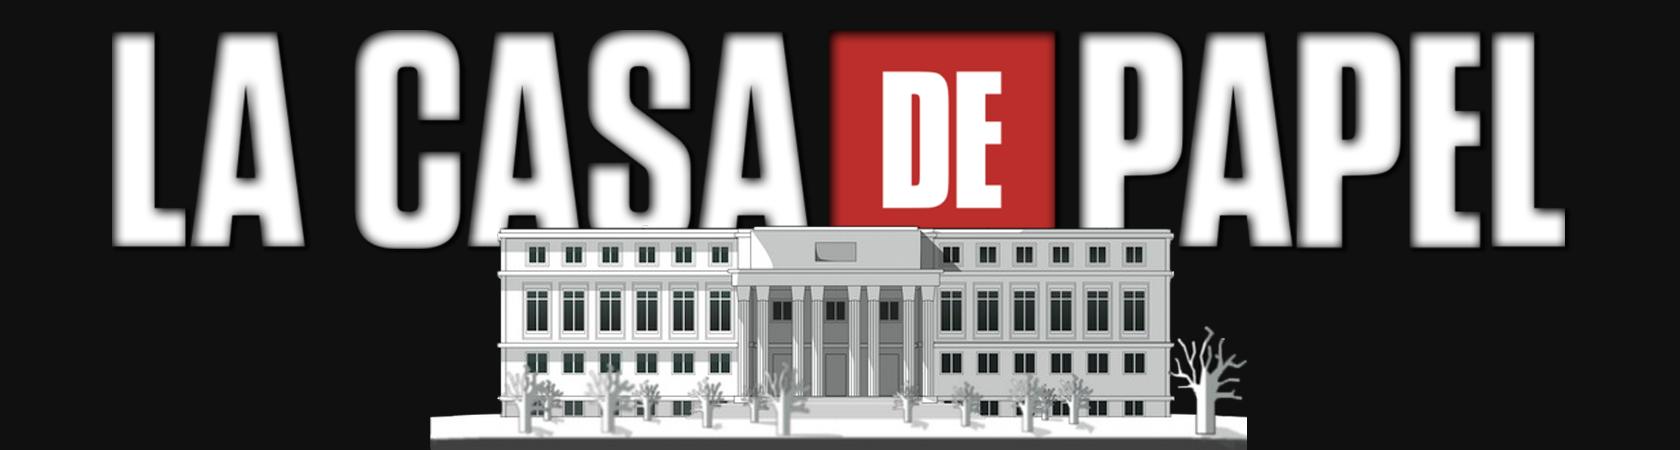 5 saveta o liderstvu iz serije La Casa De Papel